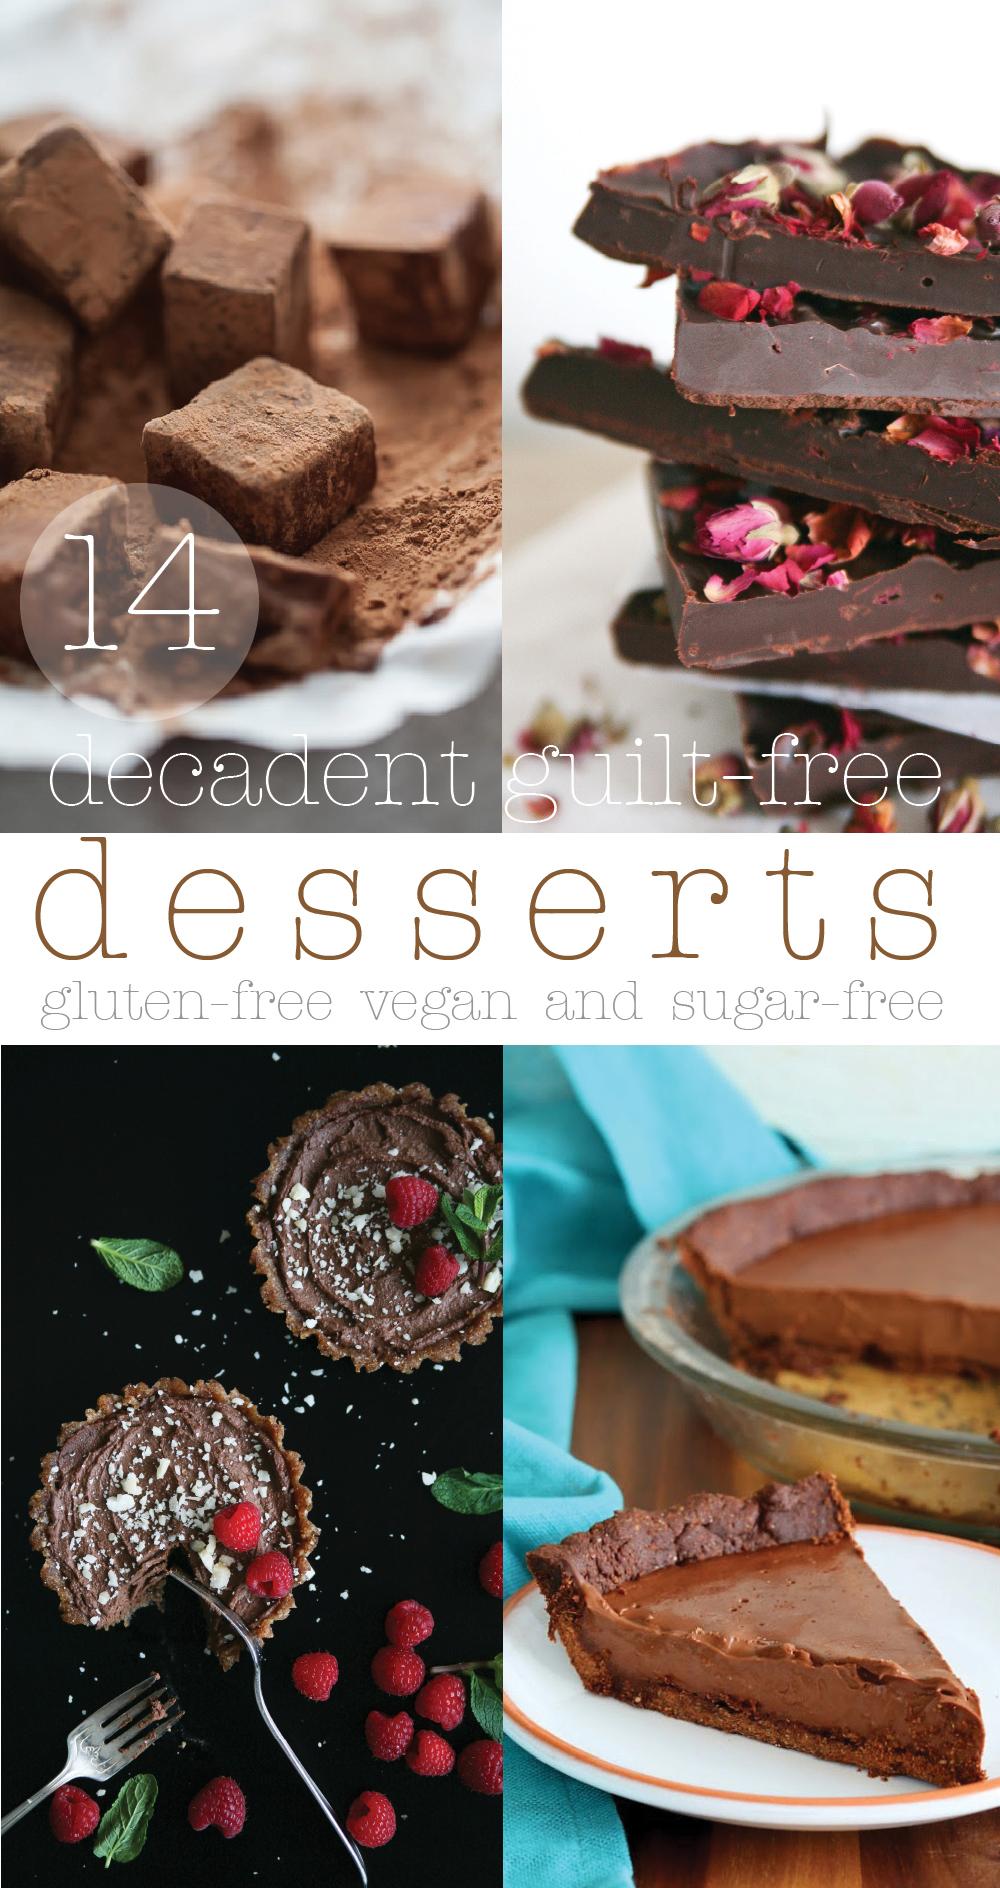 Pure Ella 14 Decadent Guilt-free Desserts gluten-free vegan sugar-free 2